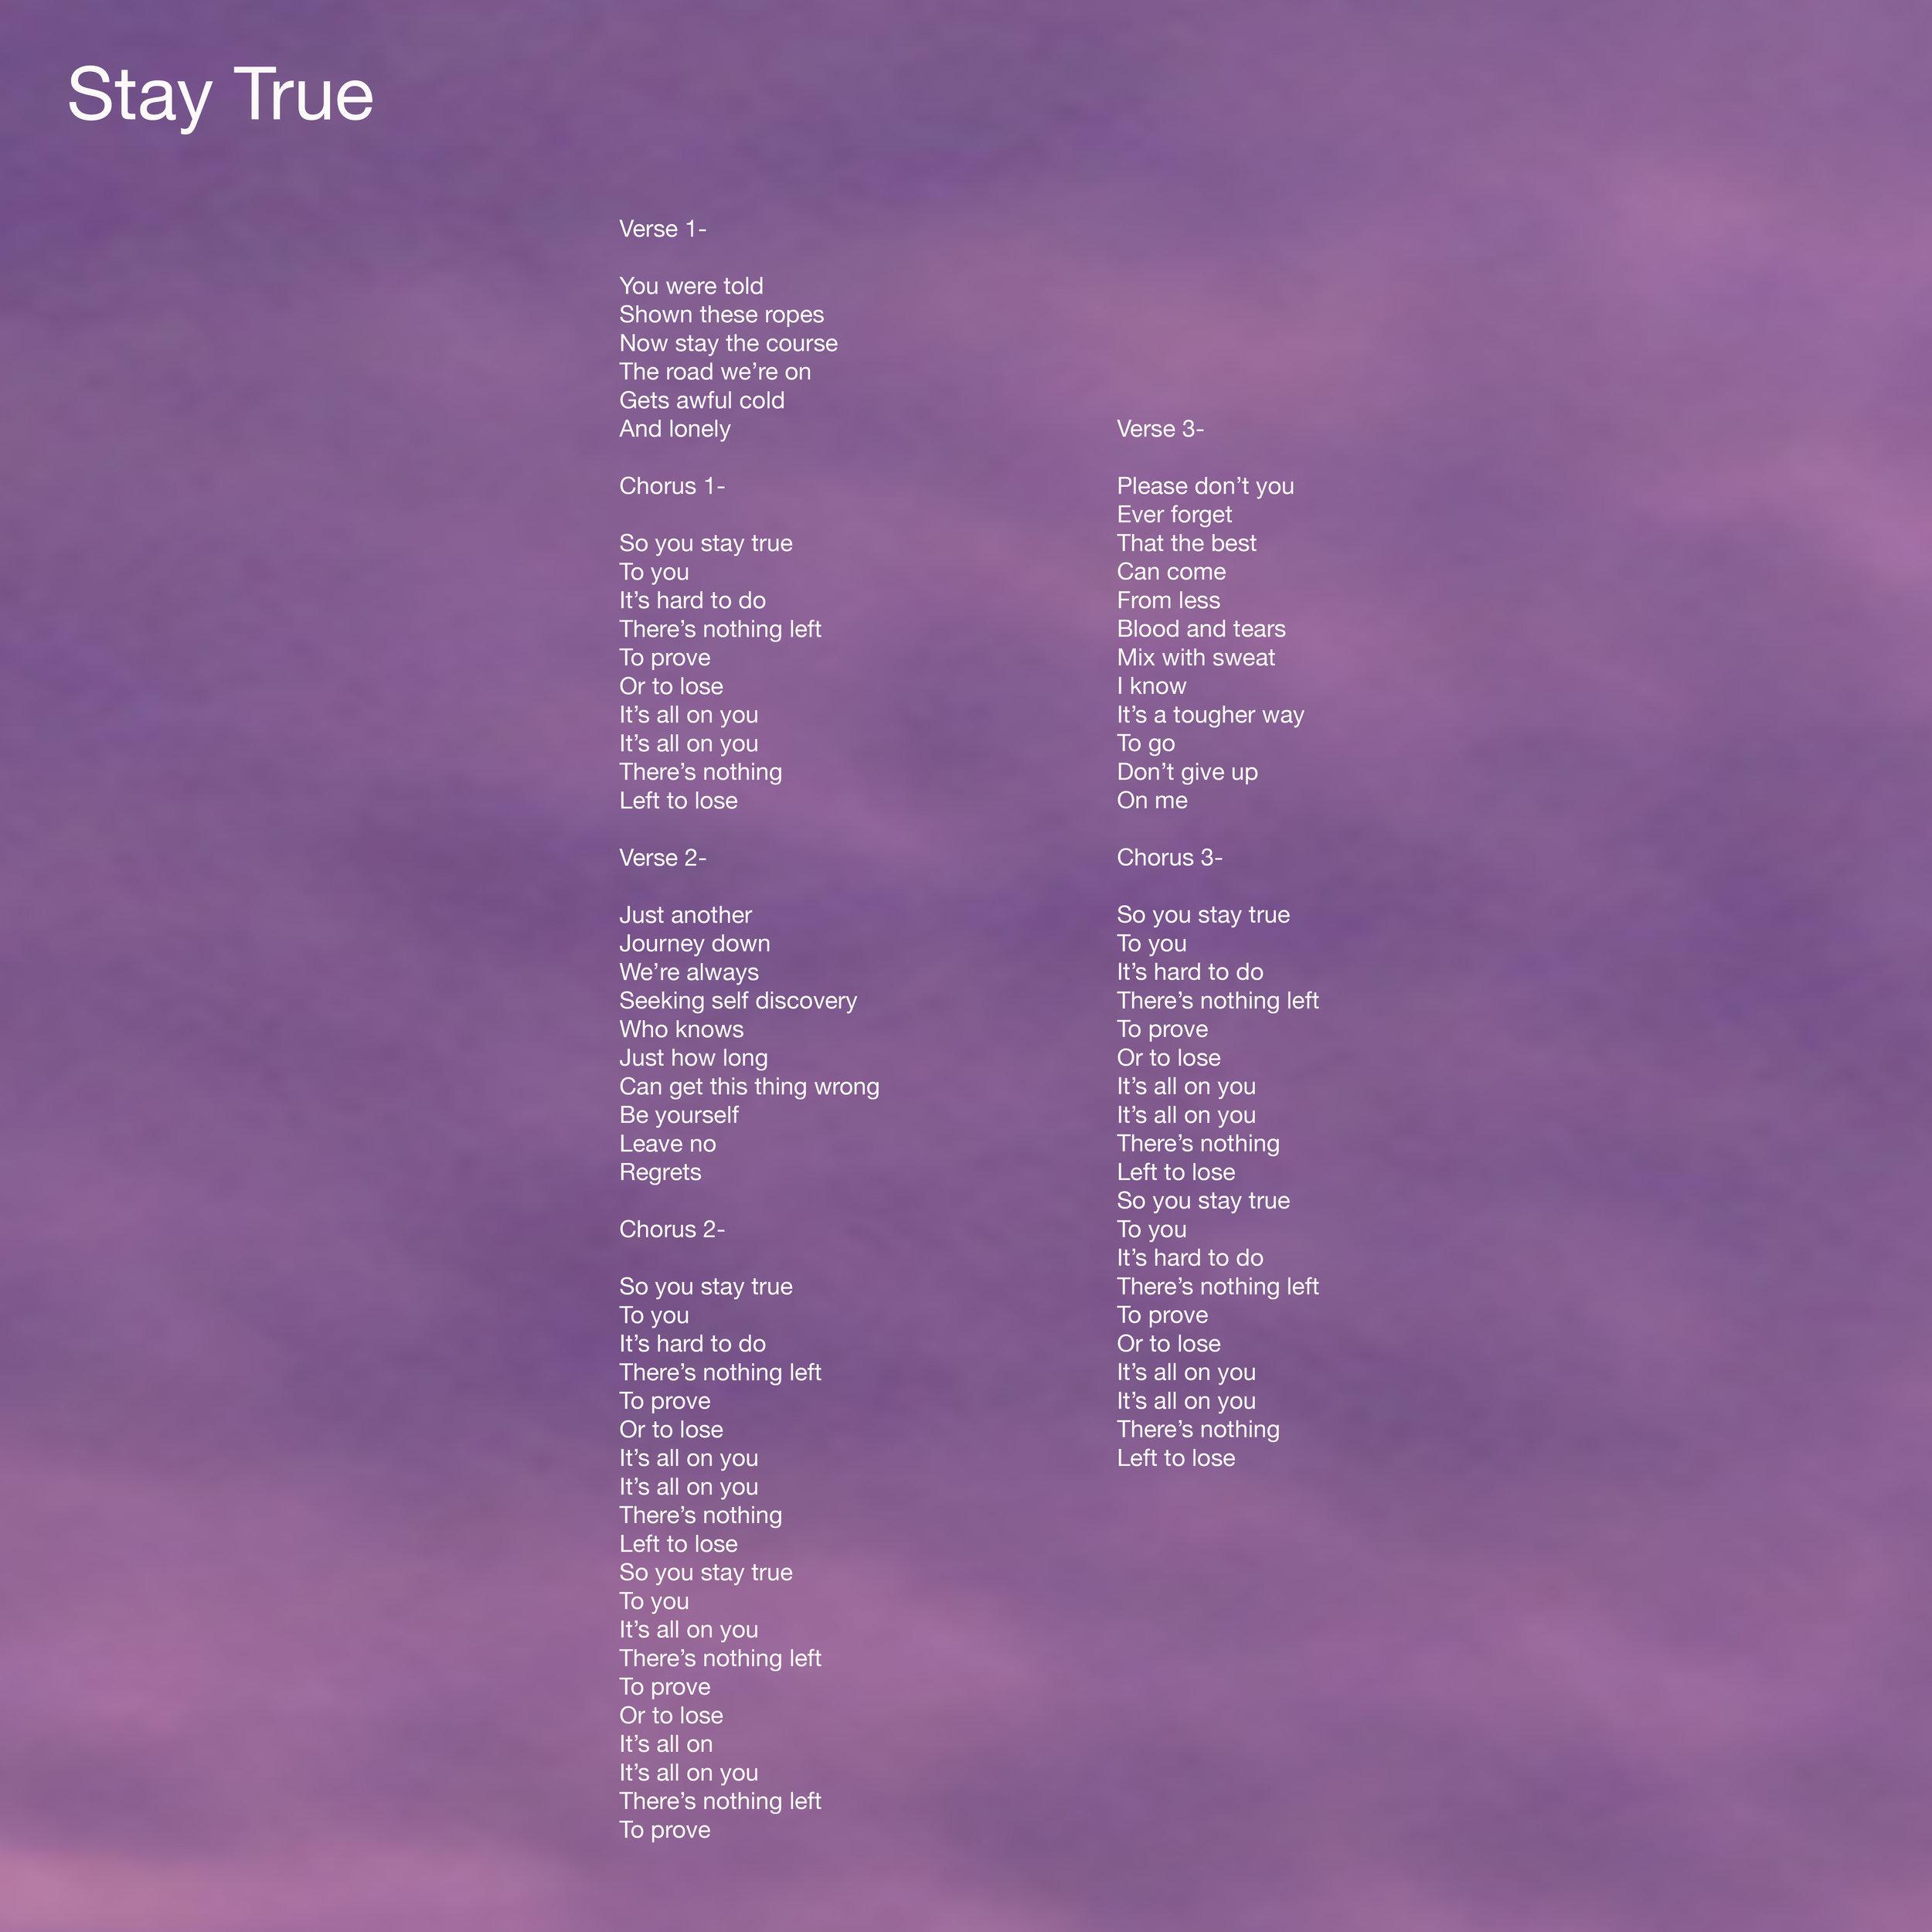 StayTrueROOM101LyricArtDLX.jpg